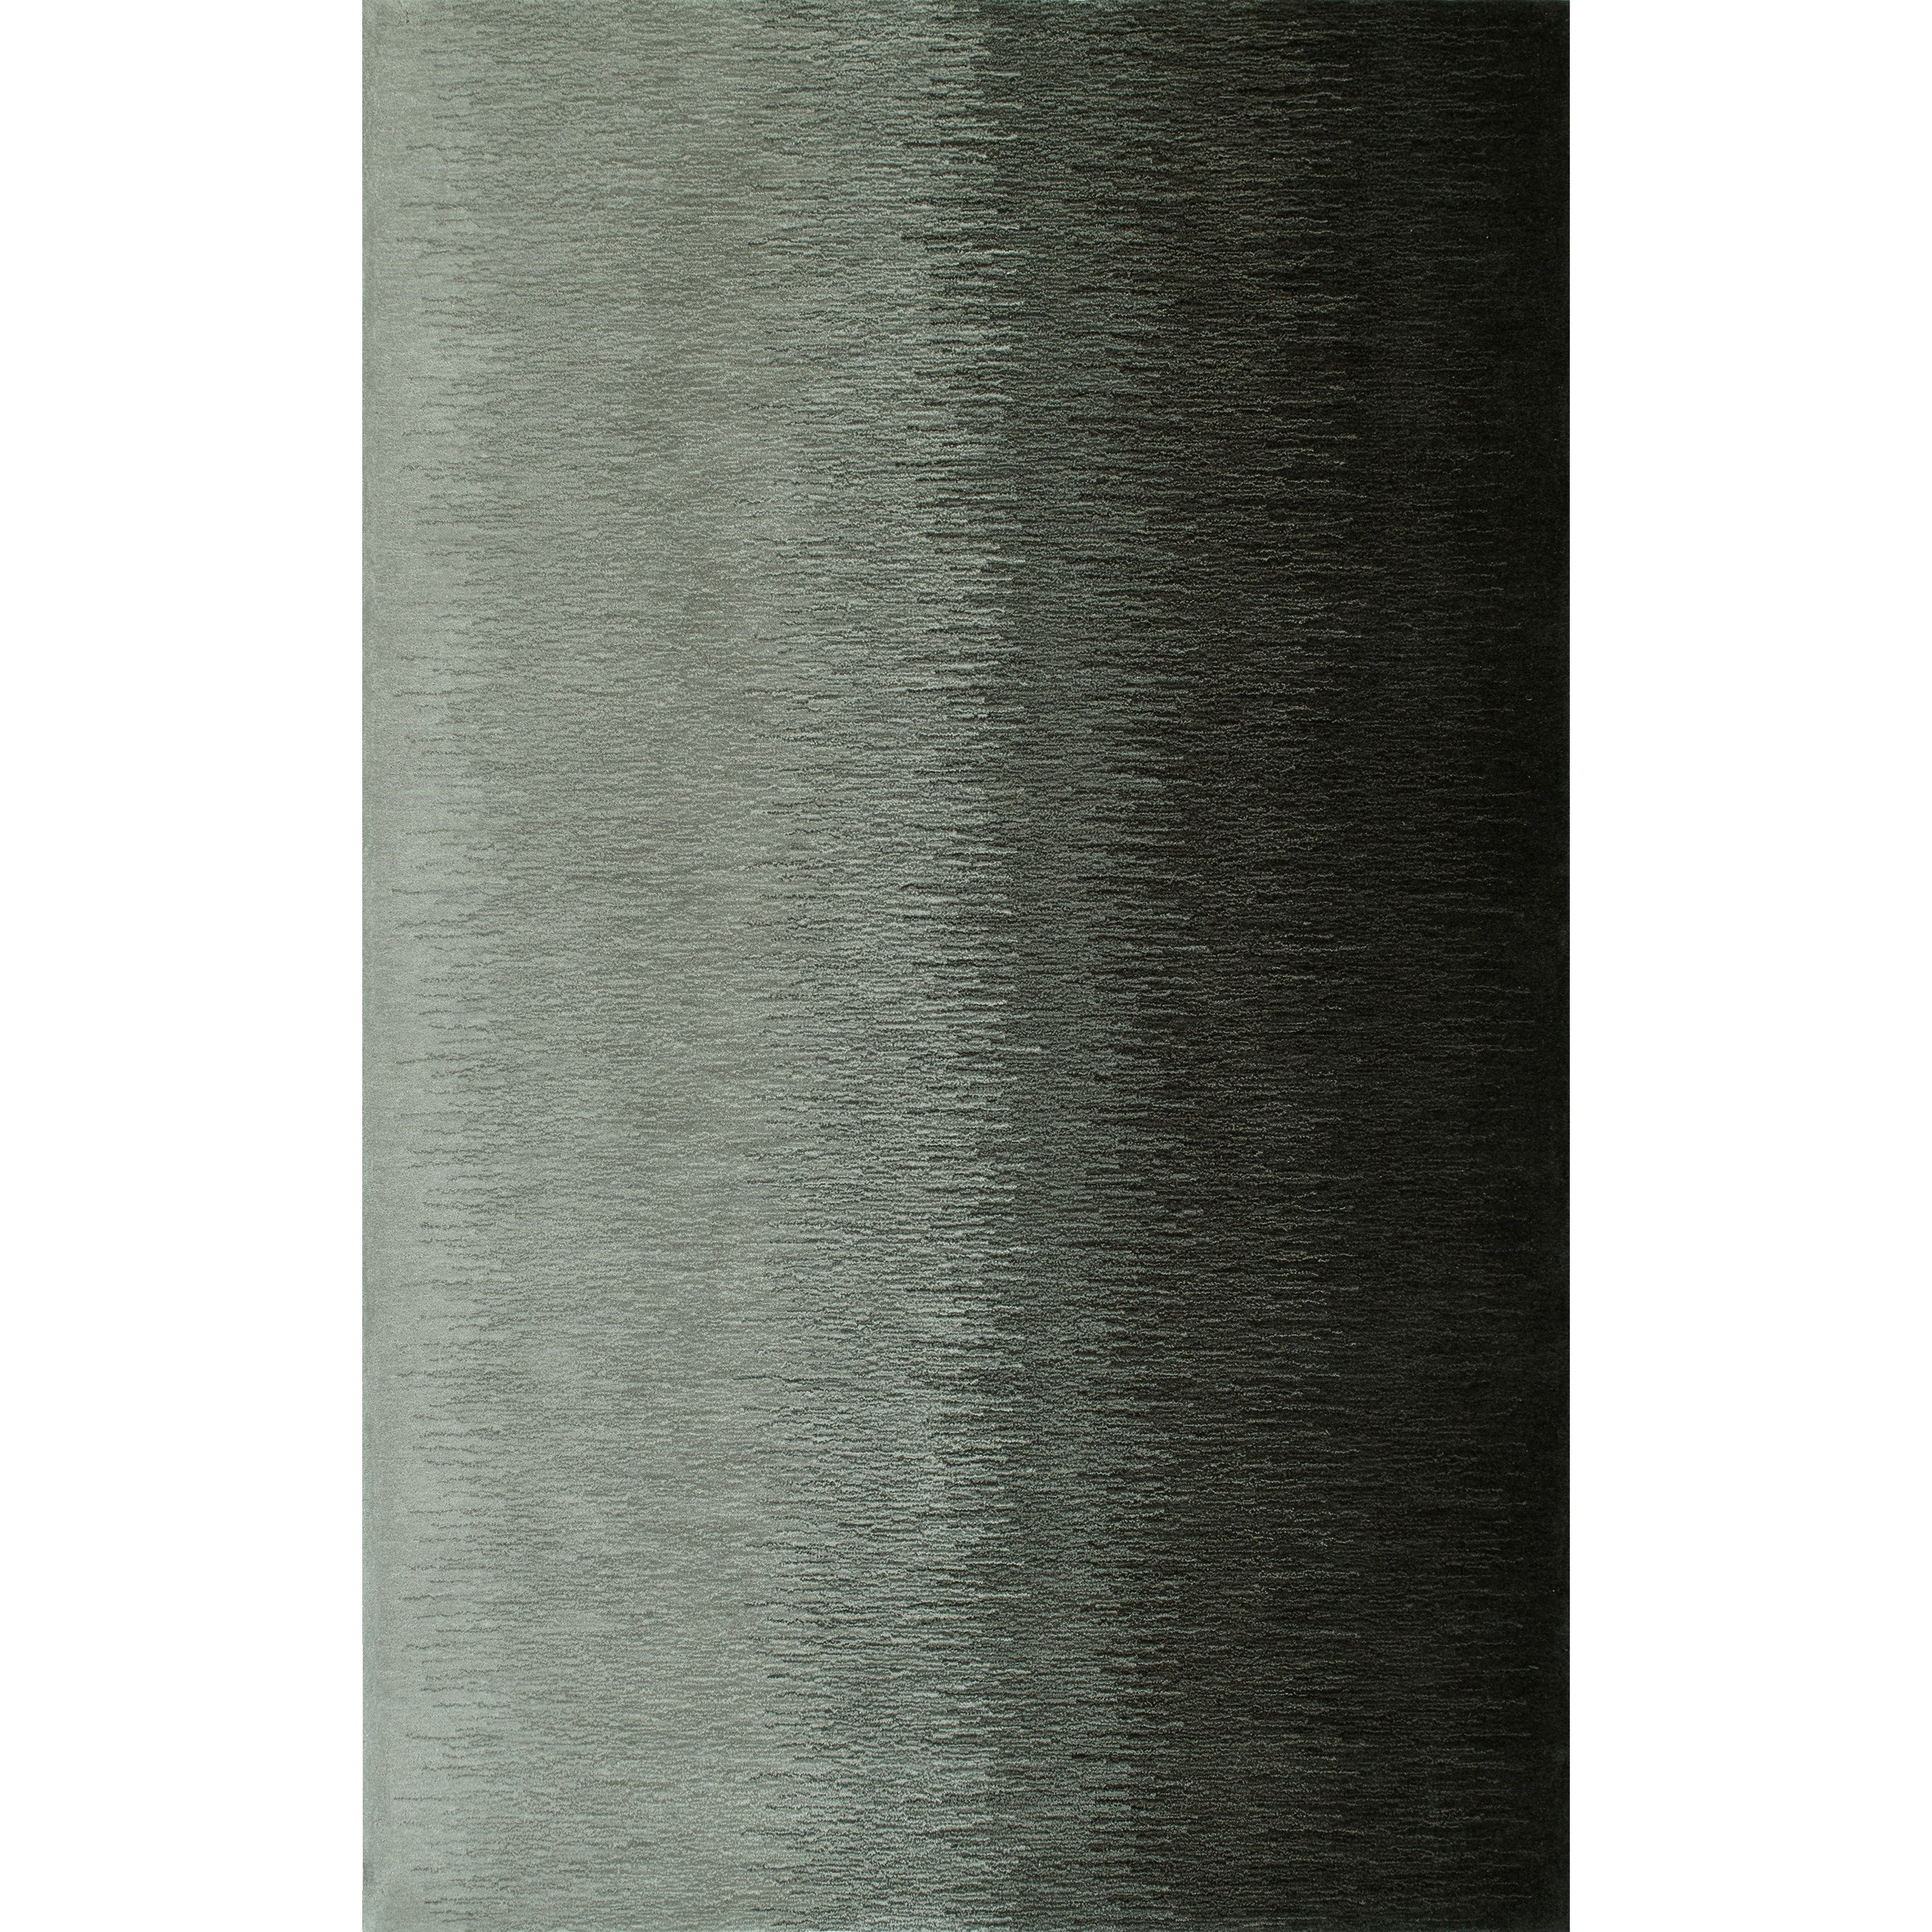 Graphite 8'X10' Rug